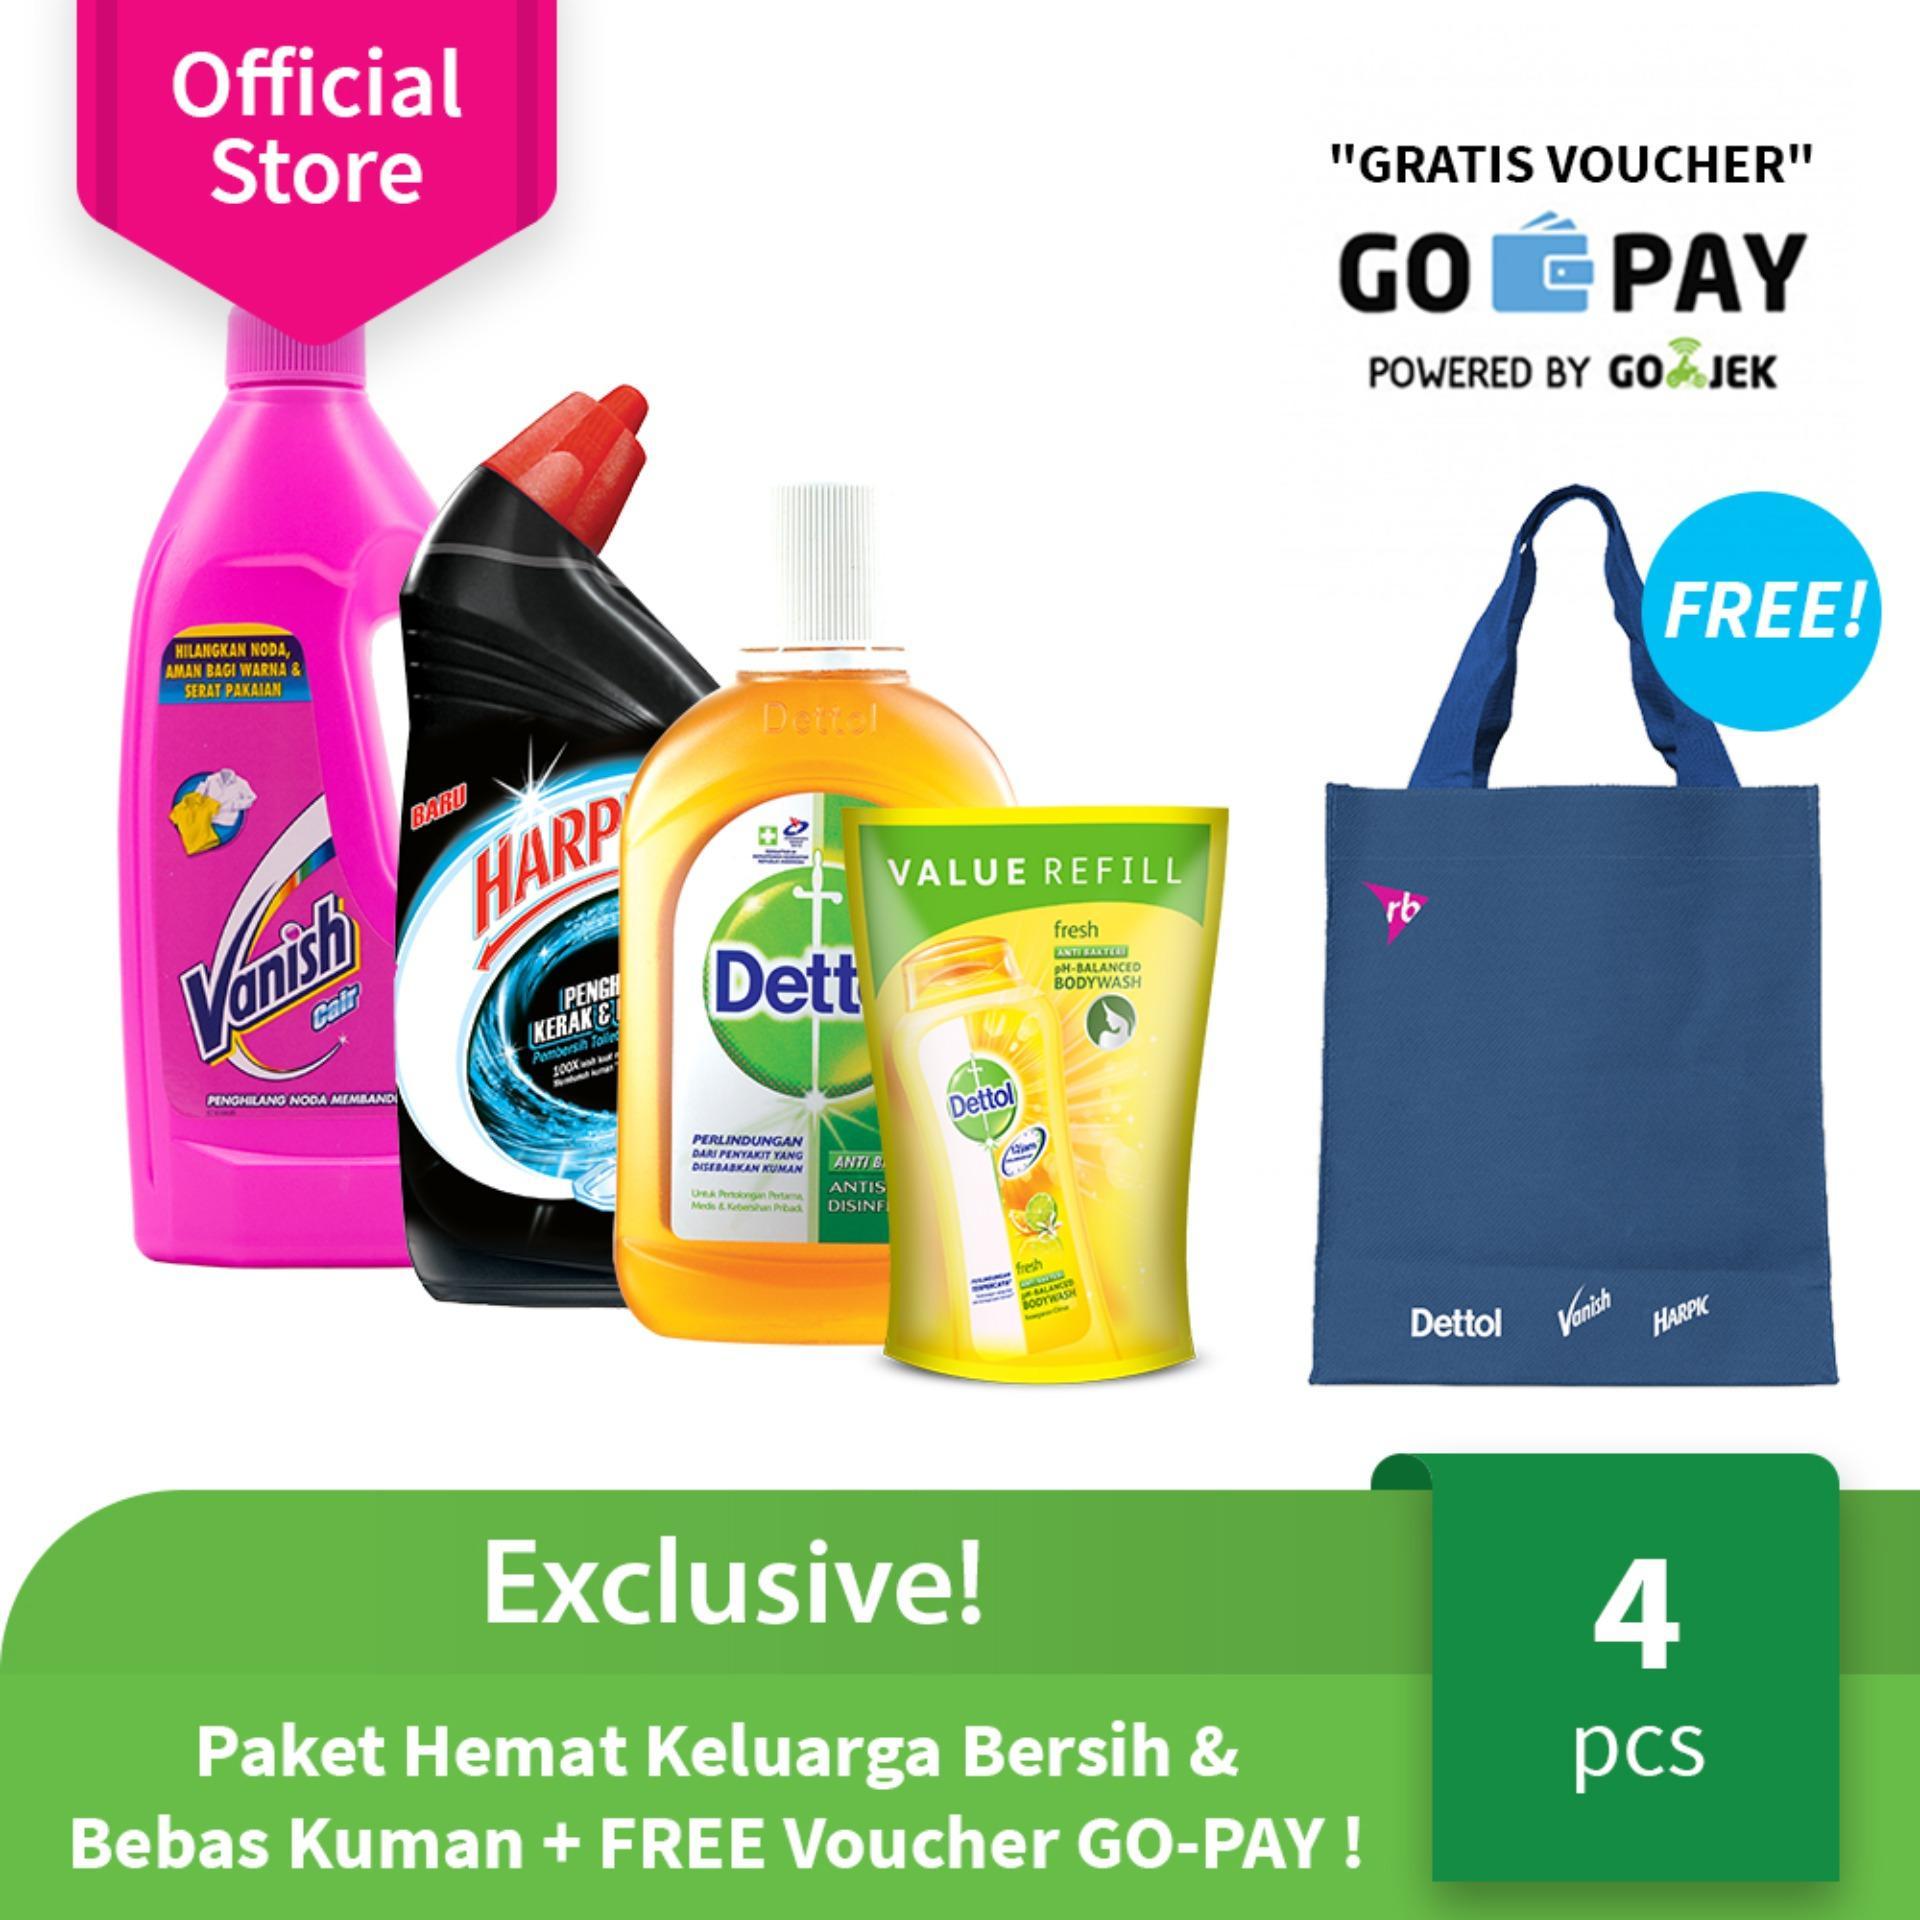 Exclusive! Paket Hemat Keluarga Bersih & Bebas Kuman + FREE Voucher GO-PAY ! (B)